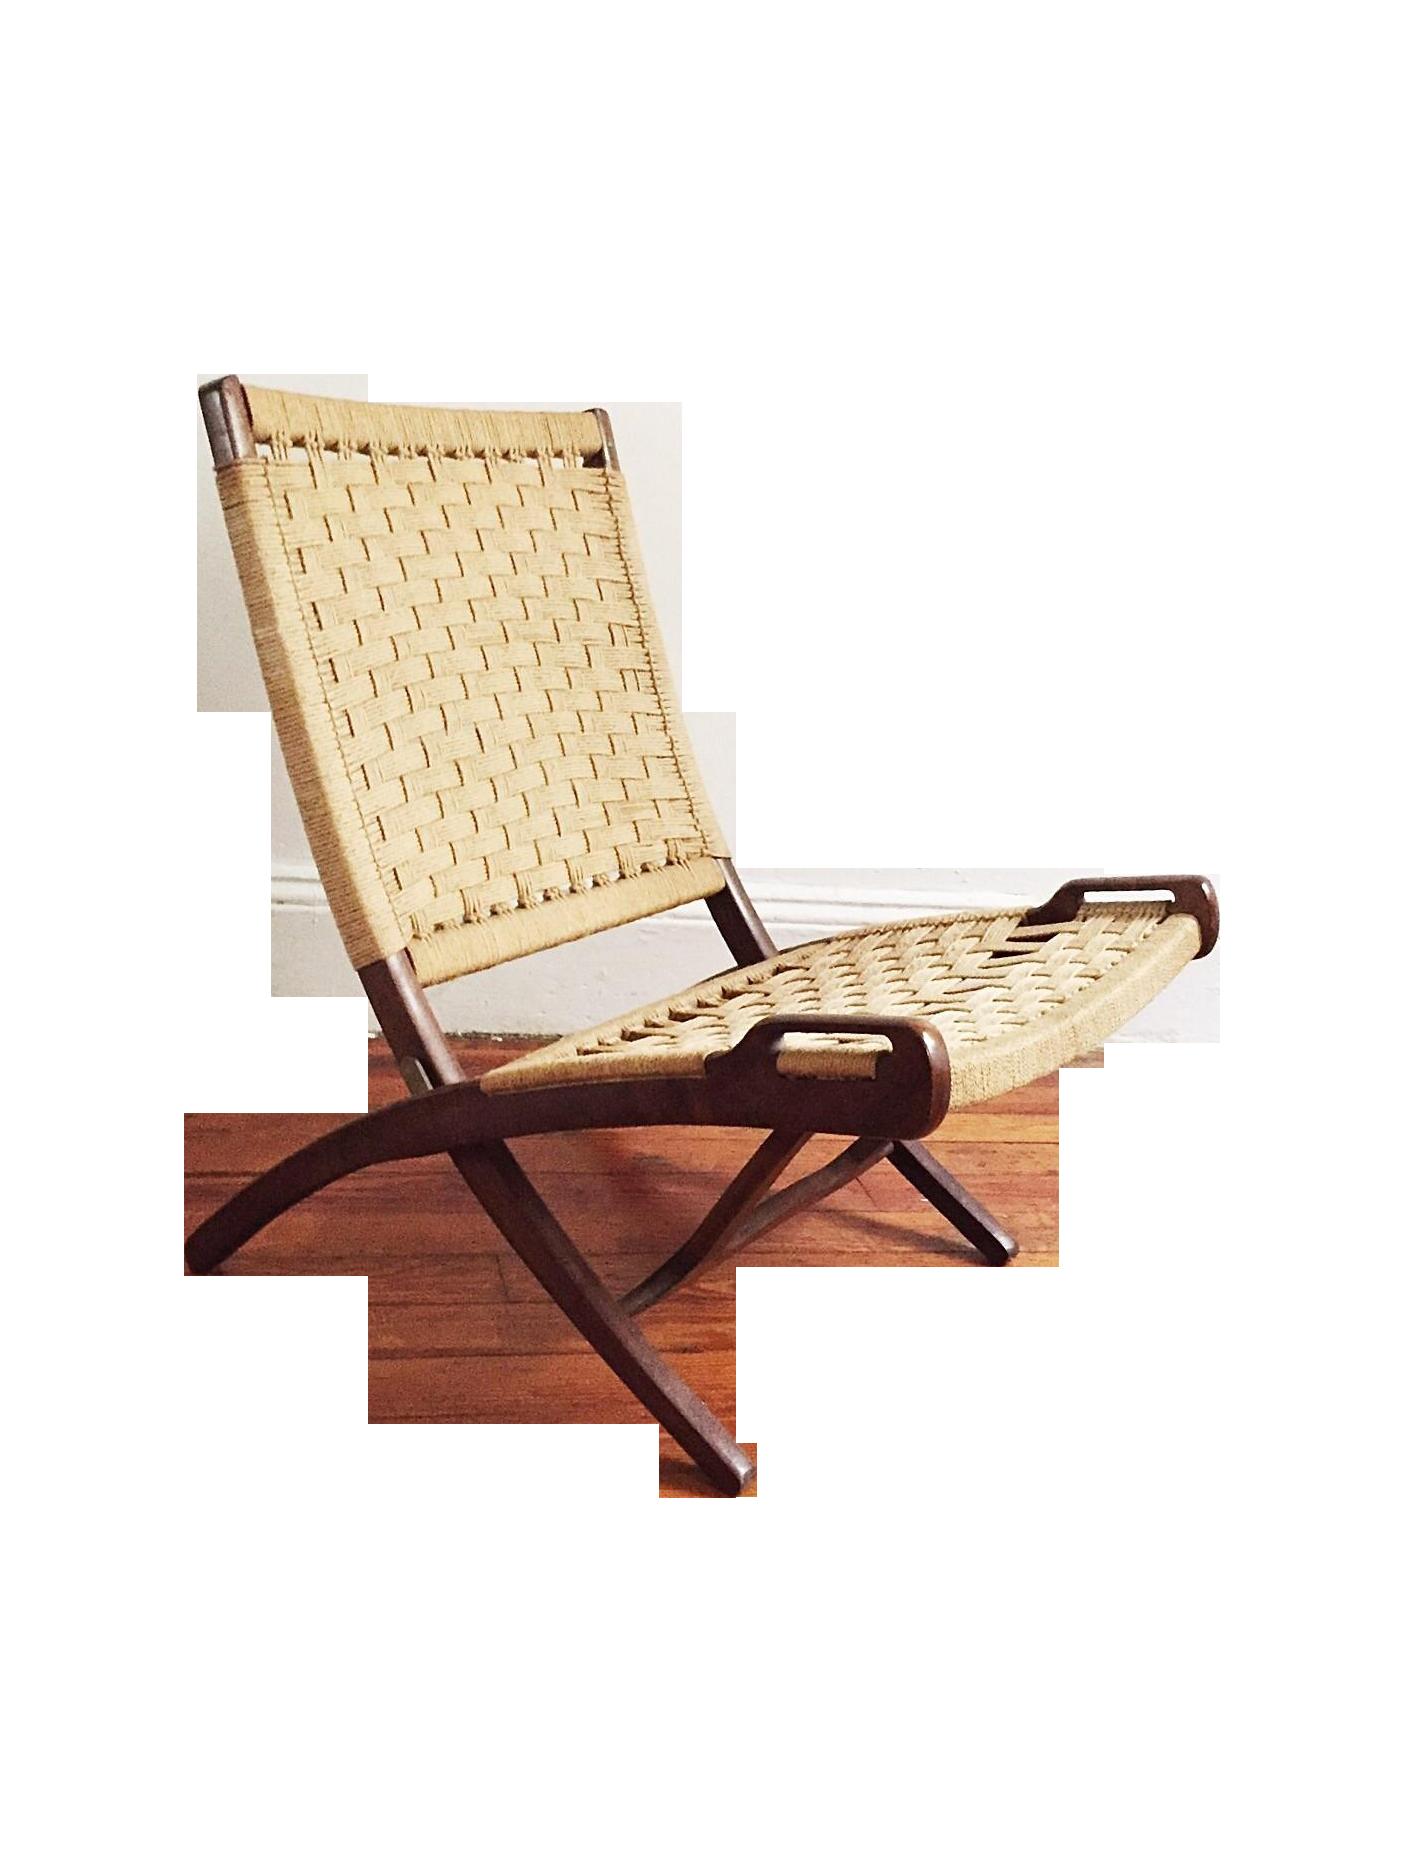 Hans Wegner Style Walnut Folding Jute Chair